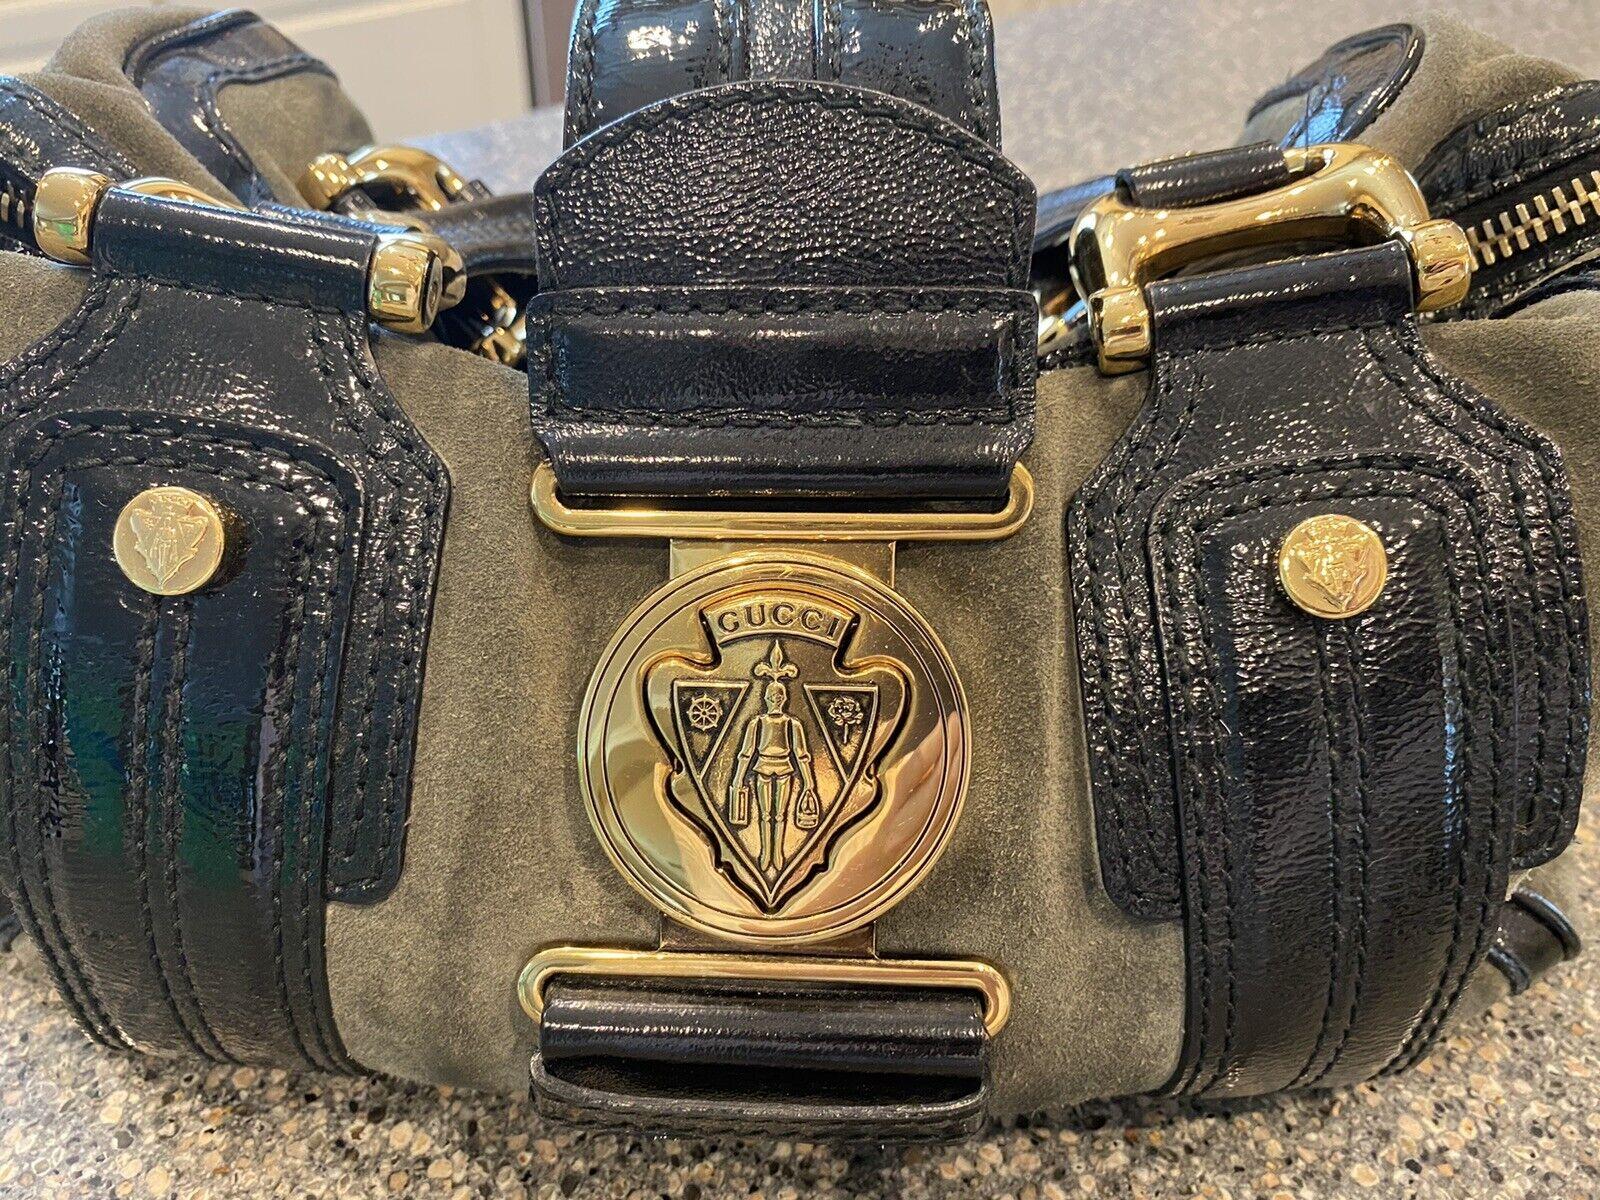 gucci handbag - image 2